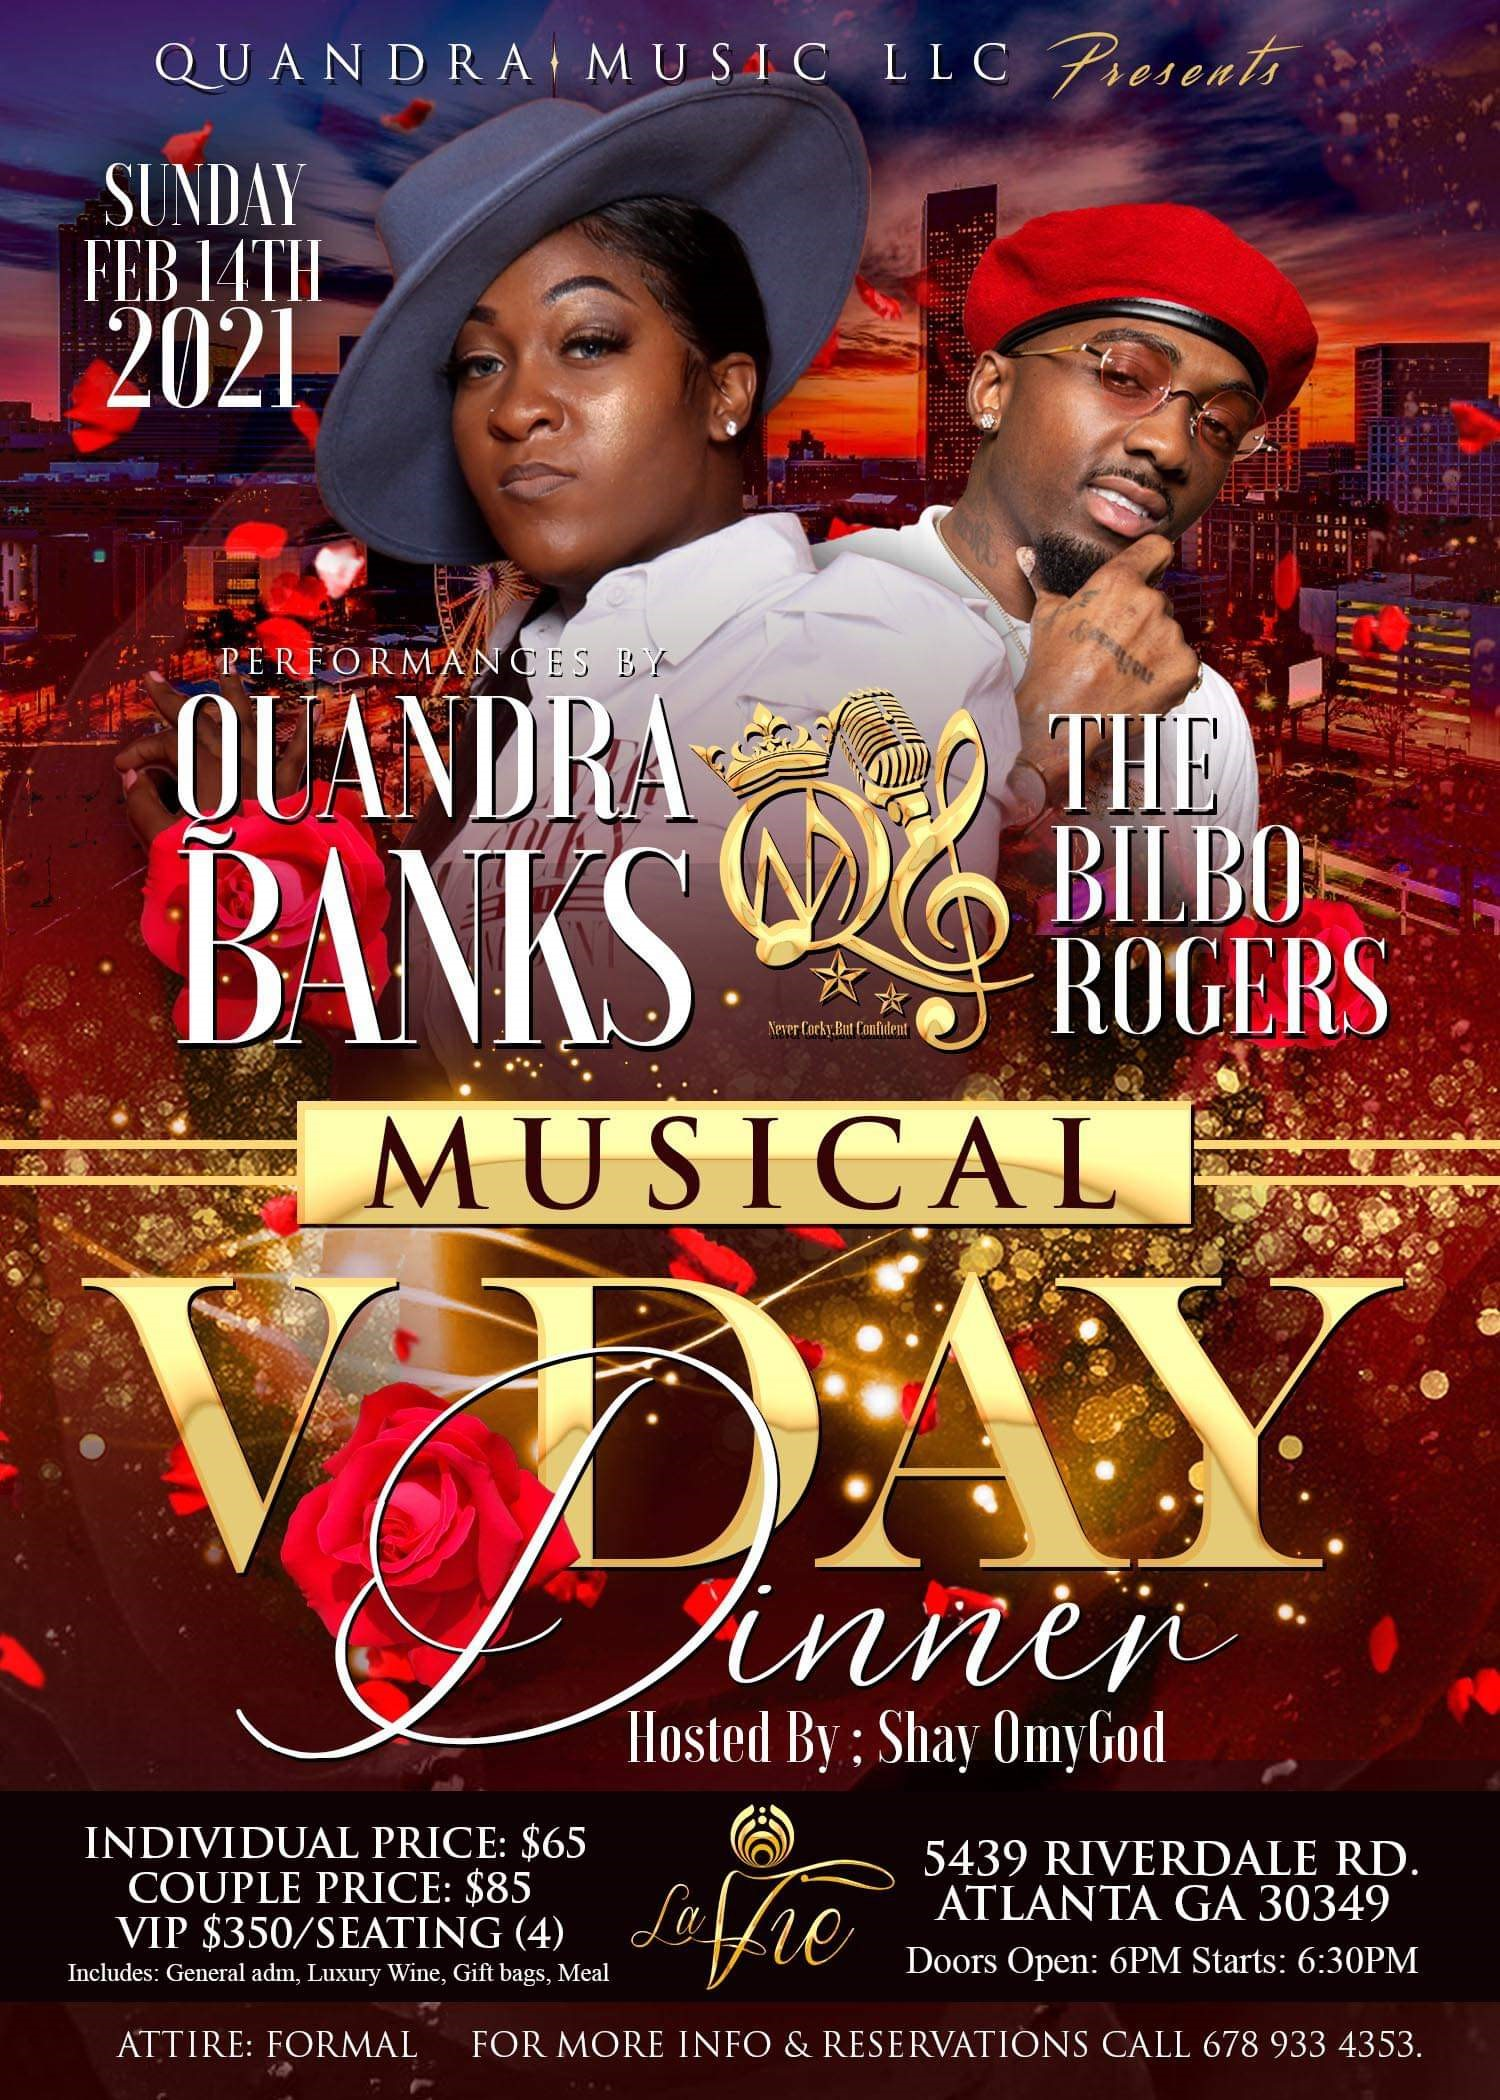 V Day Musical Dinner  on Feb 14, 18:00@La Vie - Buy tickets and Get information on K-Sound Praise Fest Music Awards